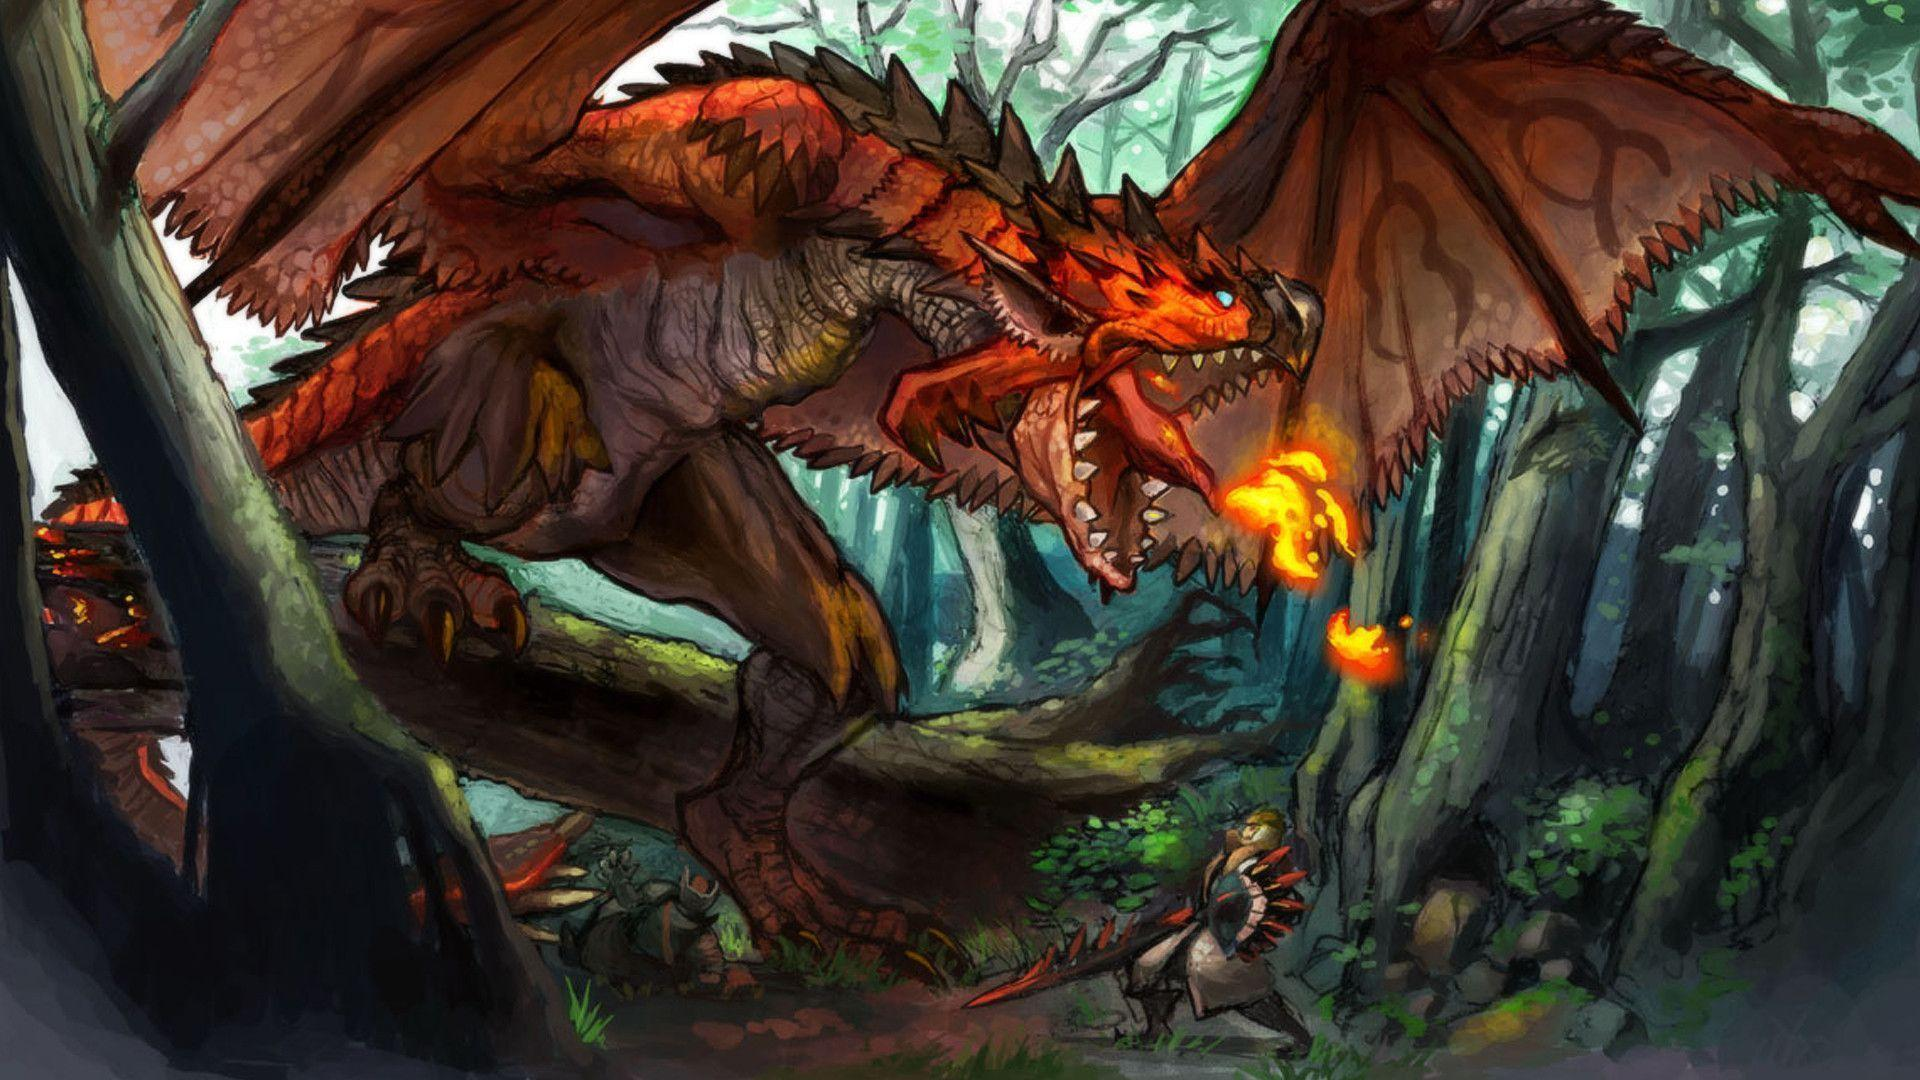 Monster Hunter Backgrounds - Wallpaper Cave